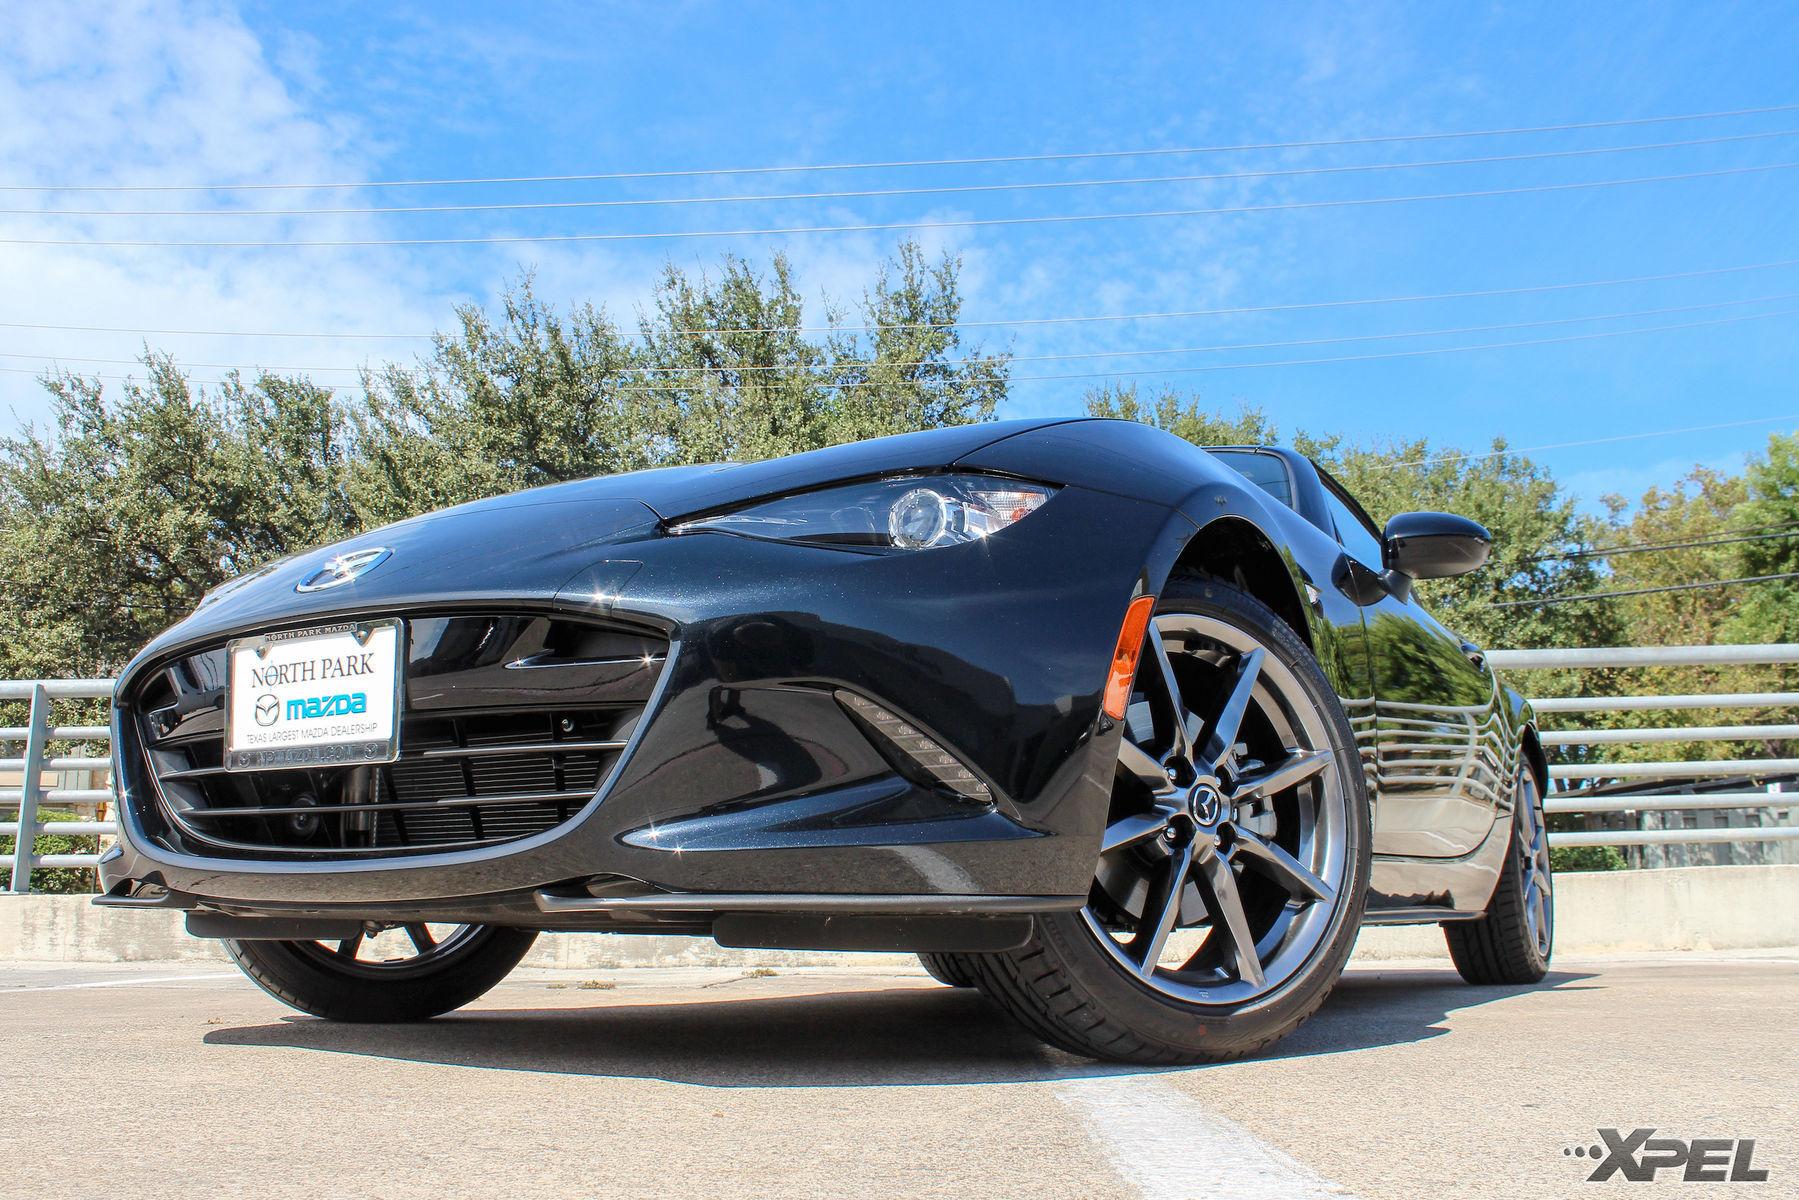 2016 Mazda MX-5 Miata | Mazda MX-5 Miata protected with XPEL ULTIMATE